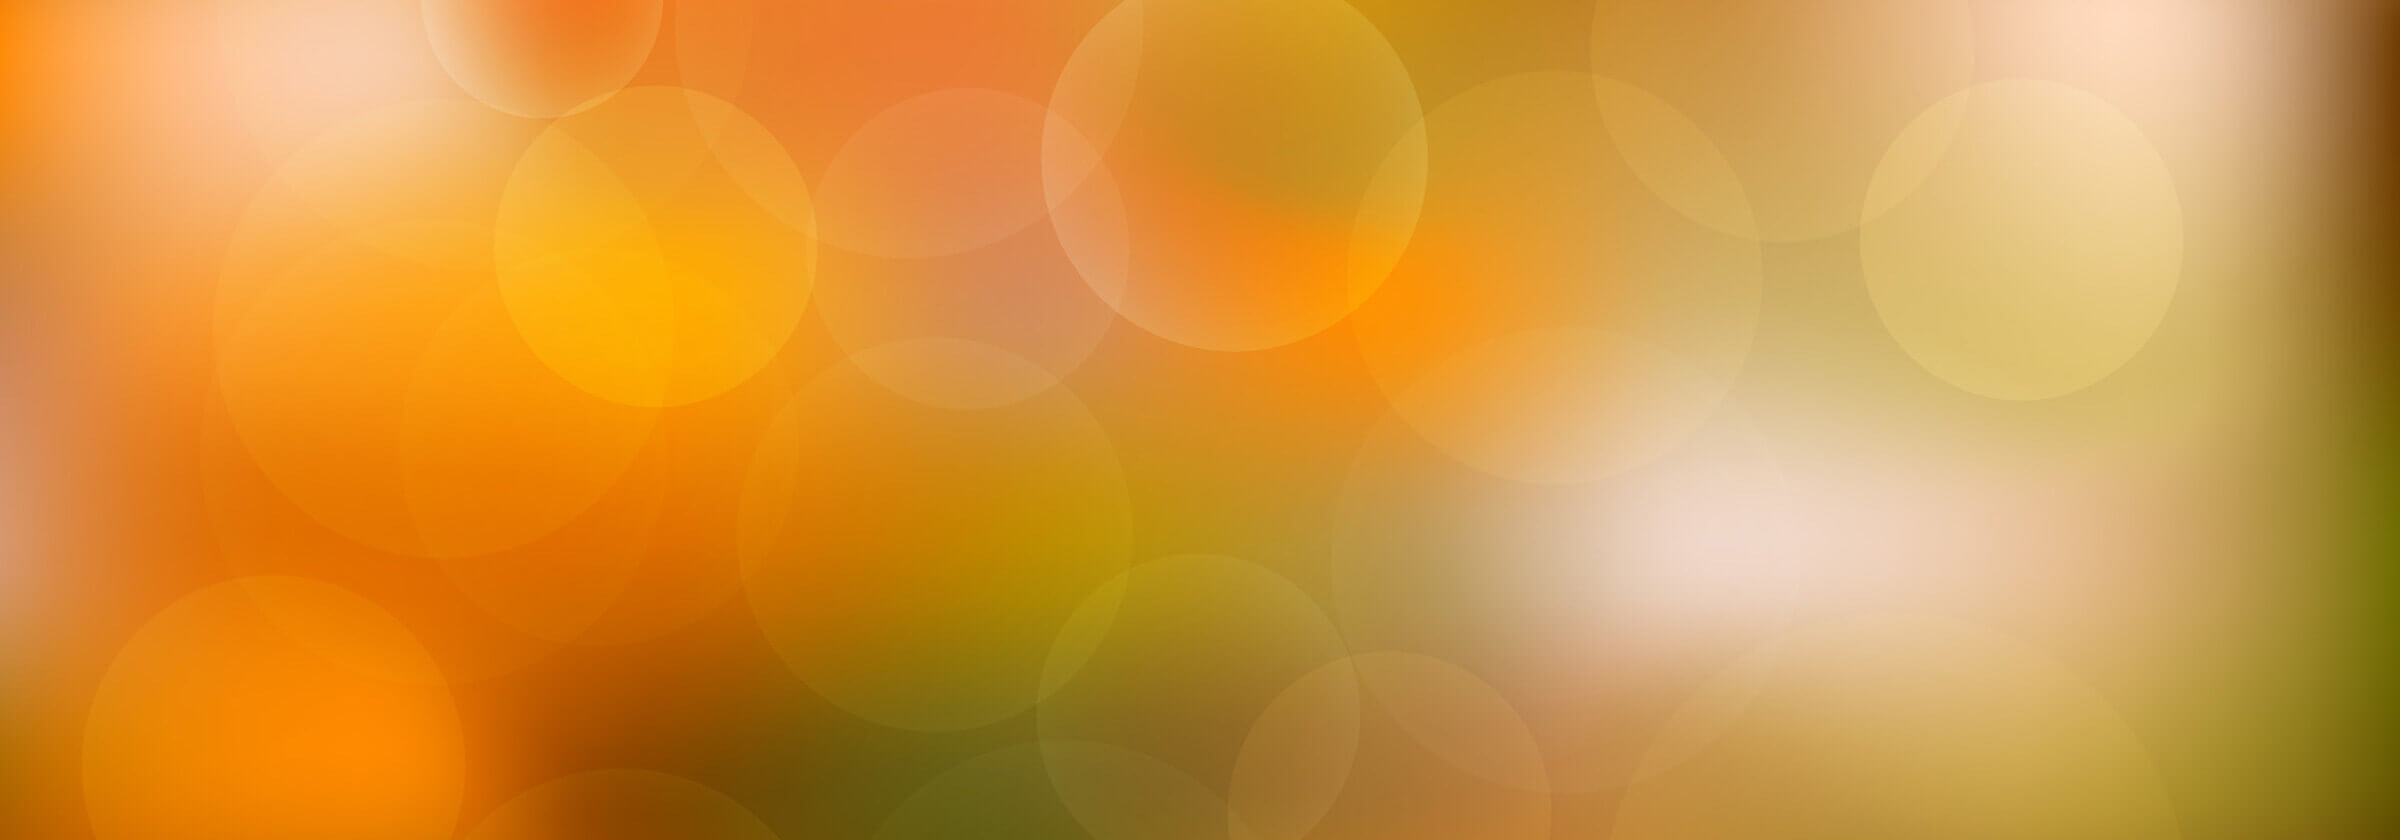 autumn-orange-bubbles-bg